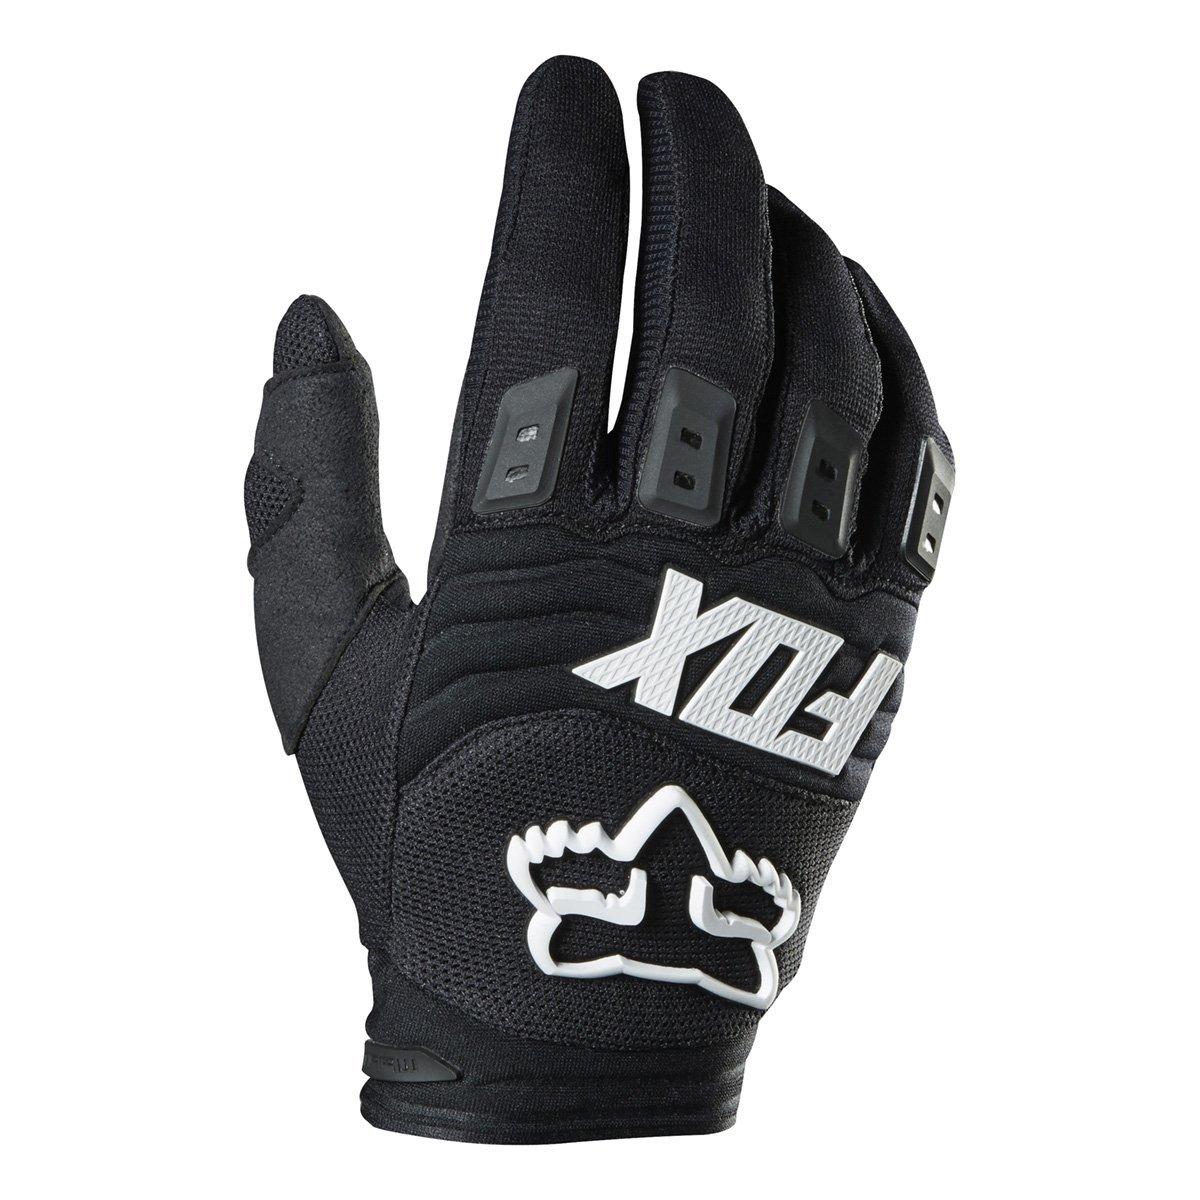 Fox Racing Dirtpaw Race Youth Boys MotoX Motorcycle Gloves - Black / Large